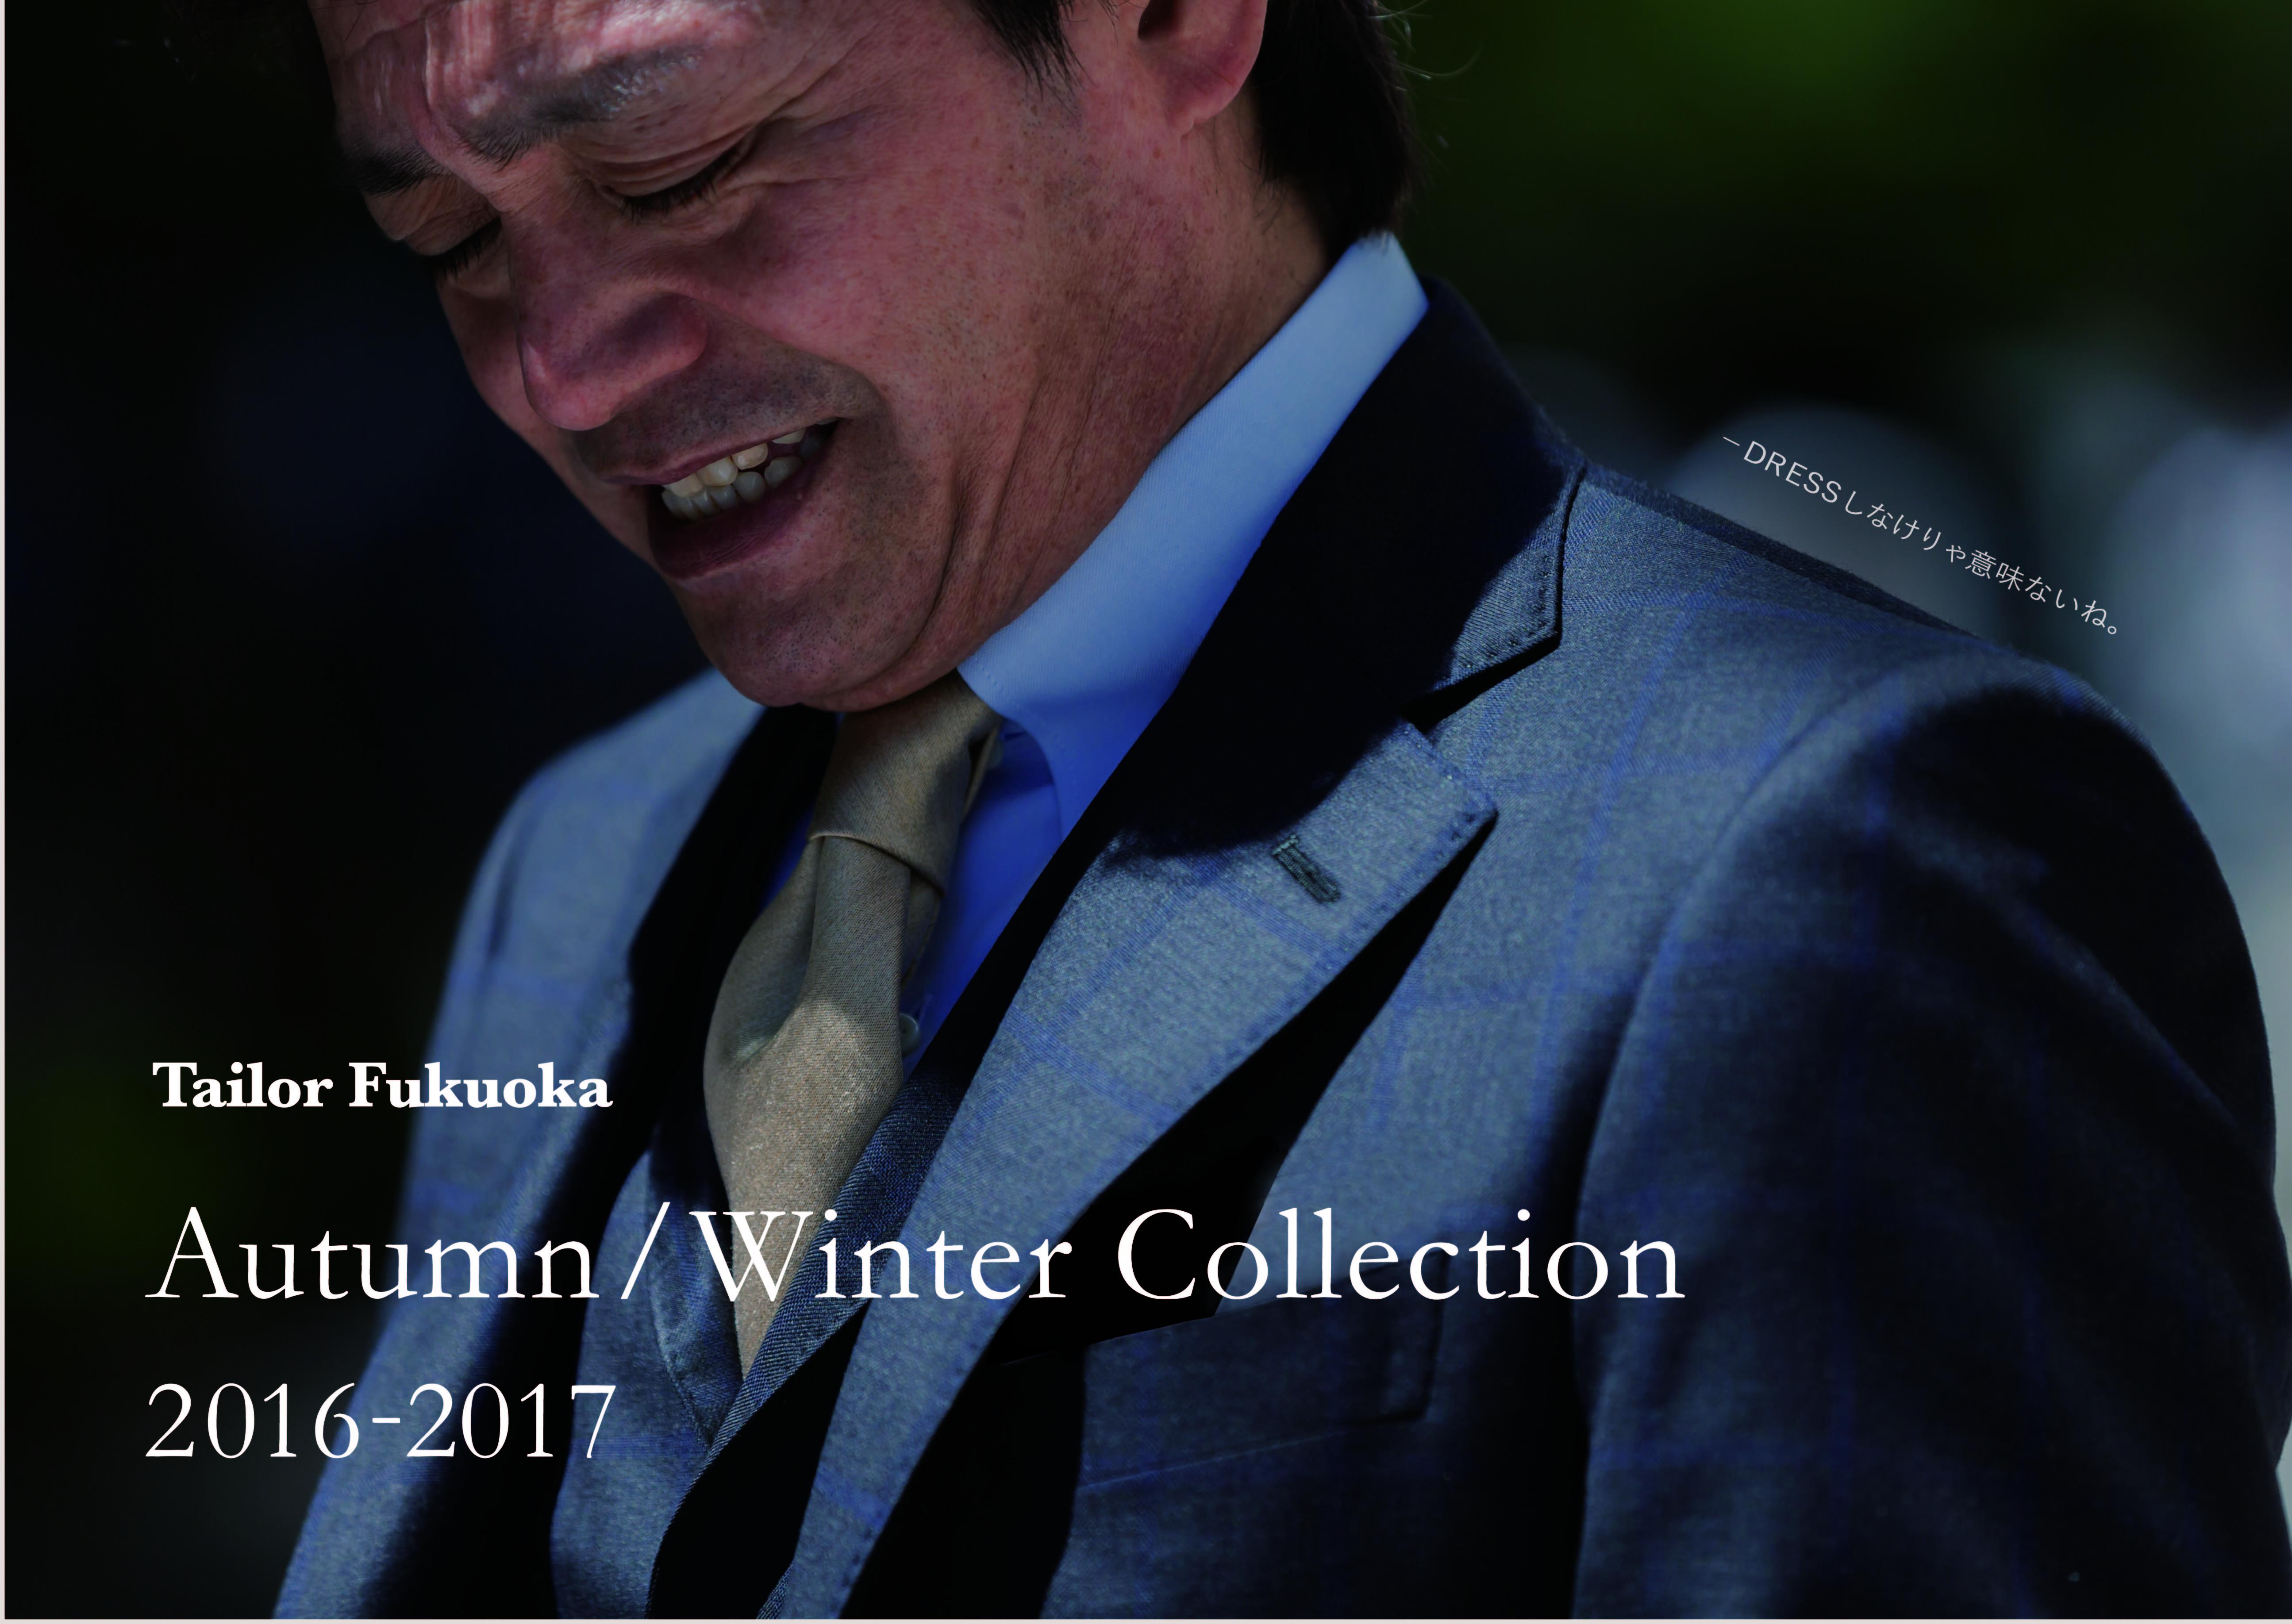 2016-2017 autumn/winter collection